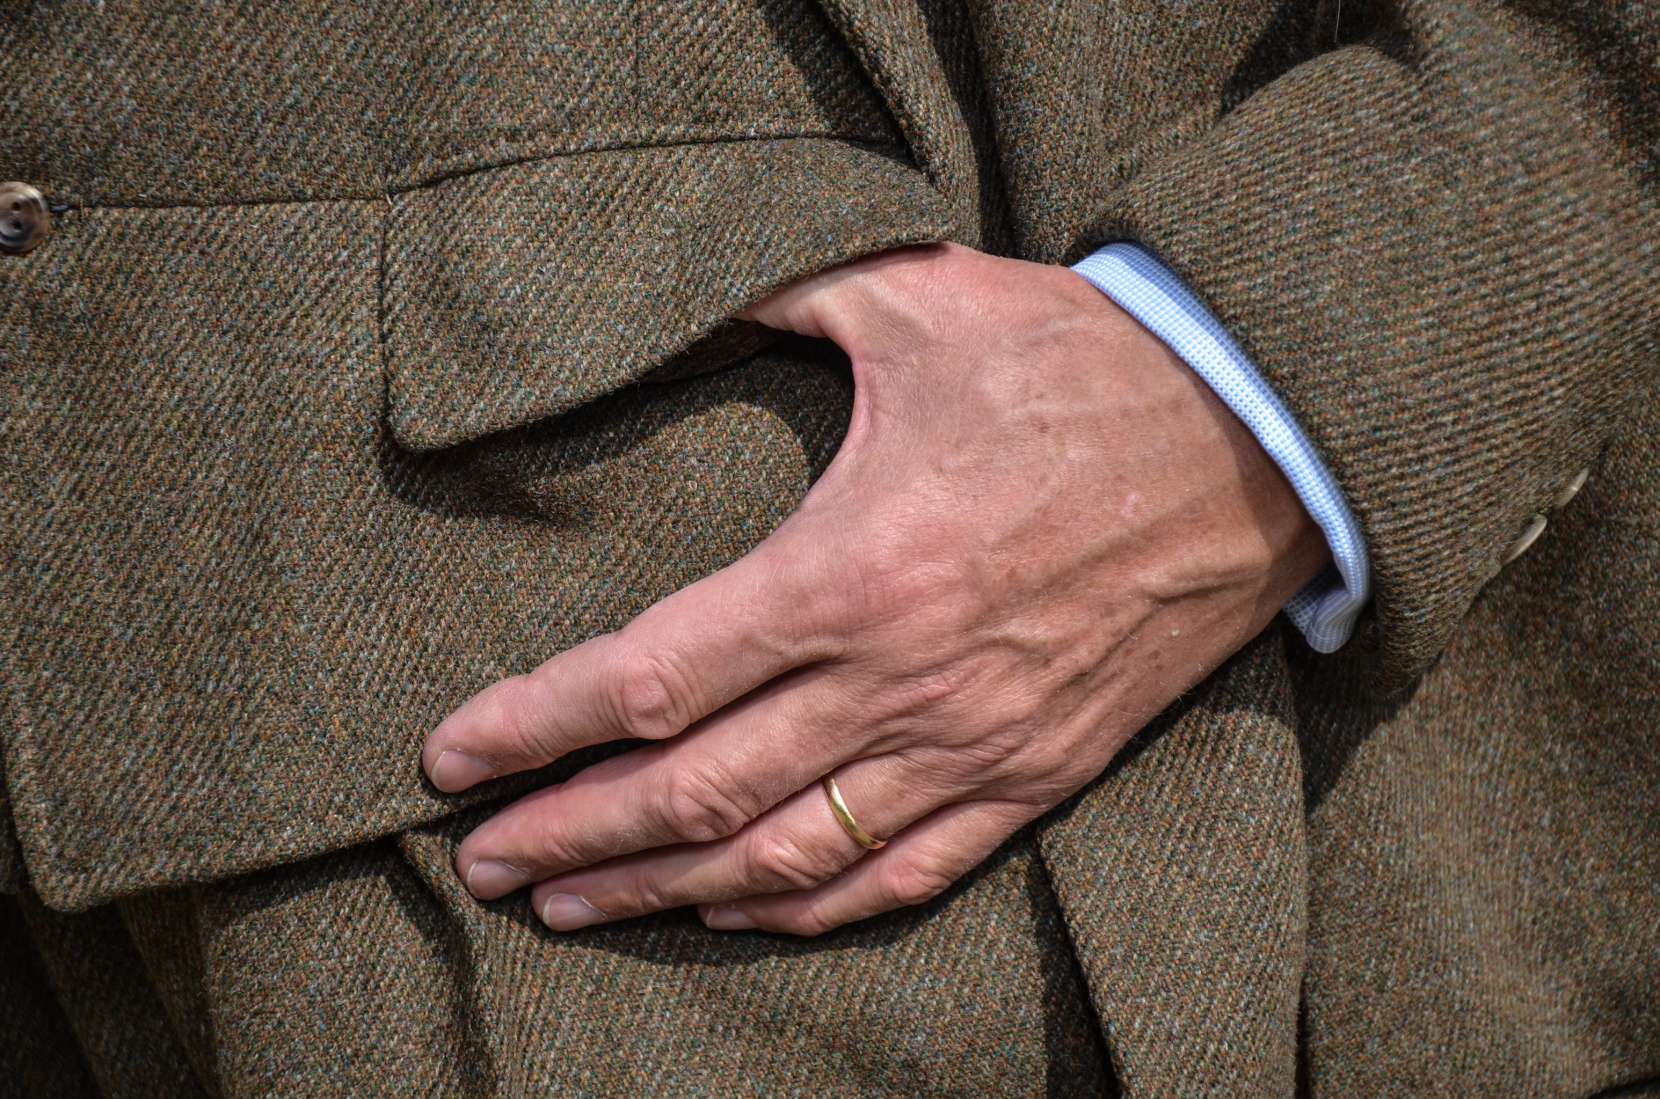 Garment-08-Shooting-Suit-0164-1660x1099.jpg